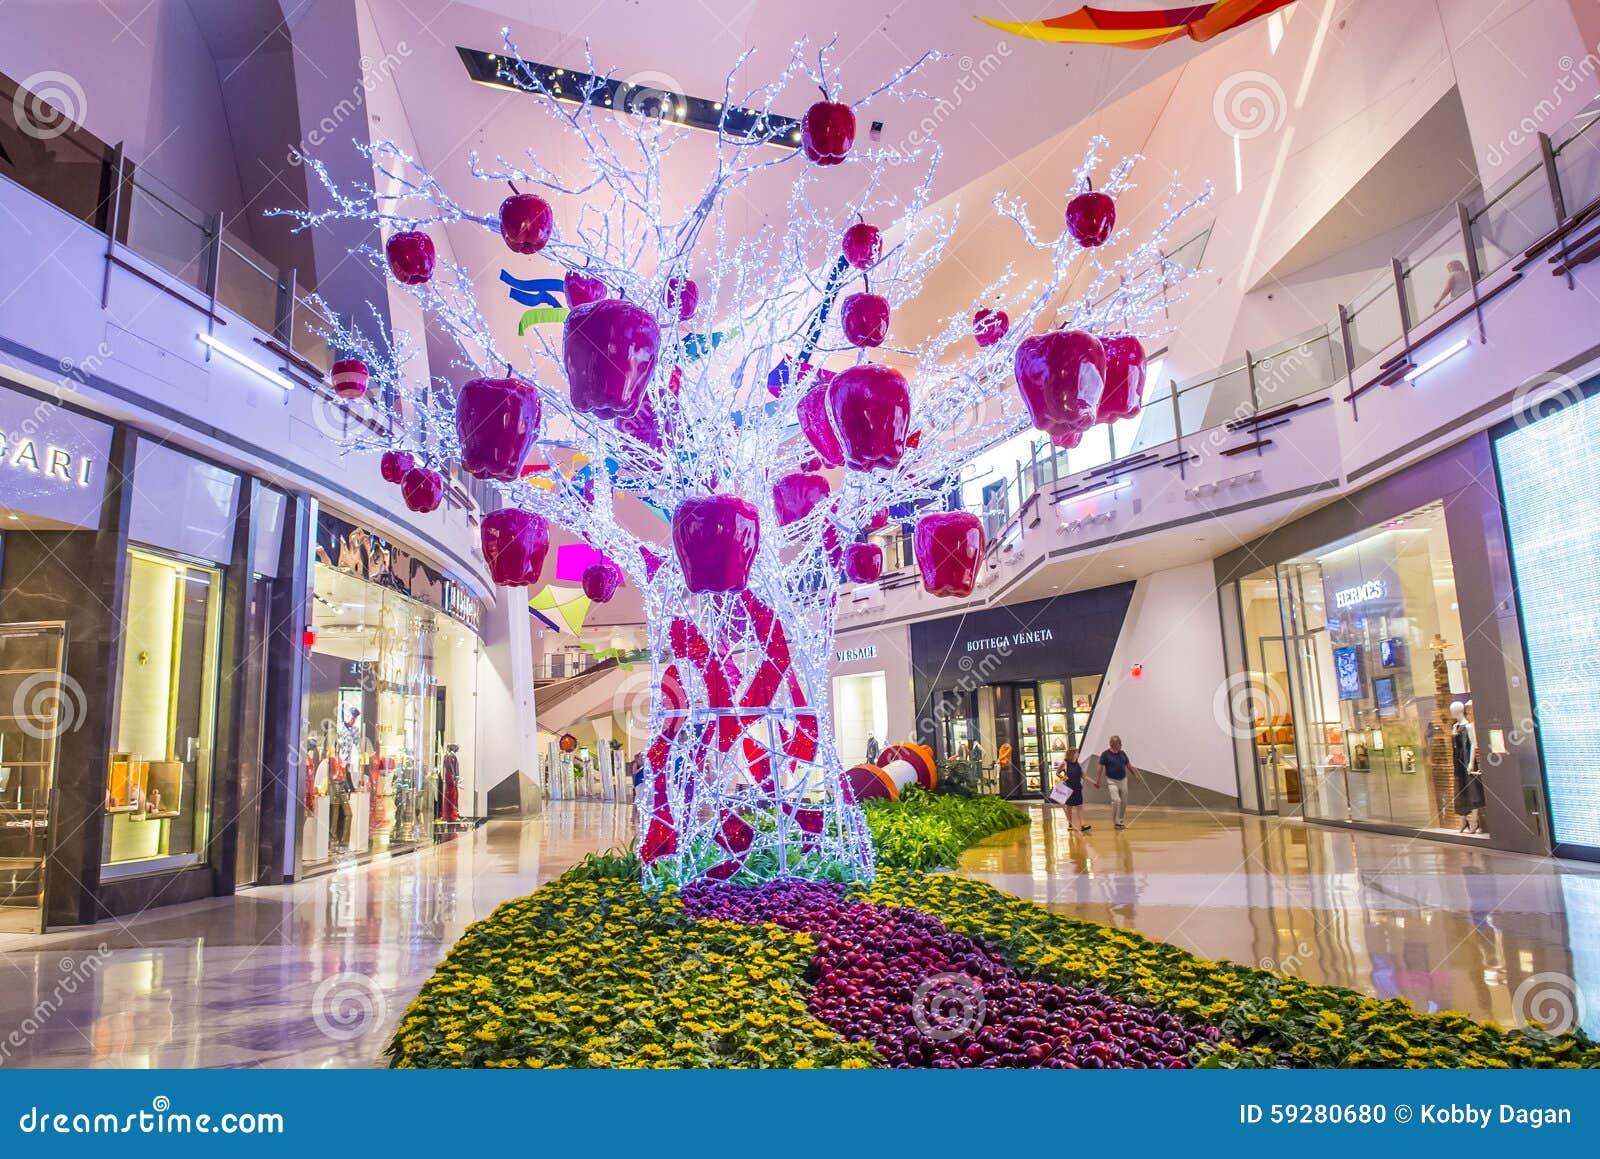 Las Vegas Crystals mall editorial image  Image of resort - 59280680